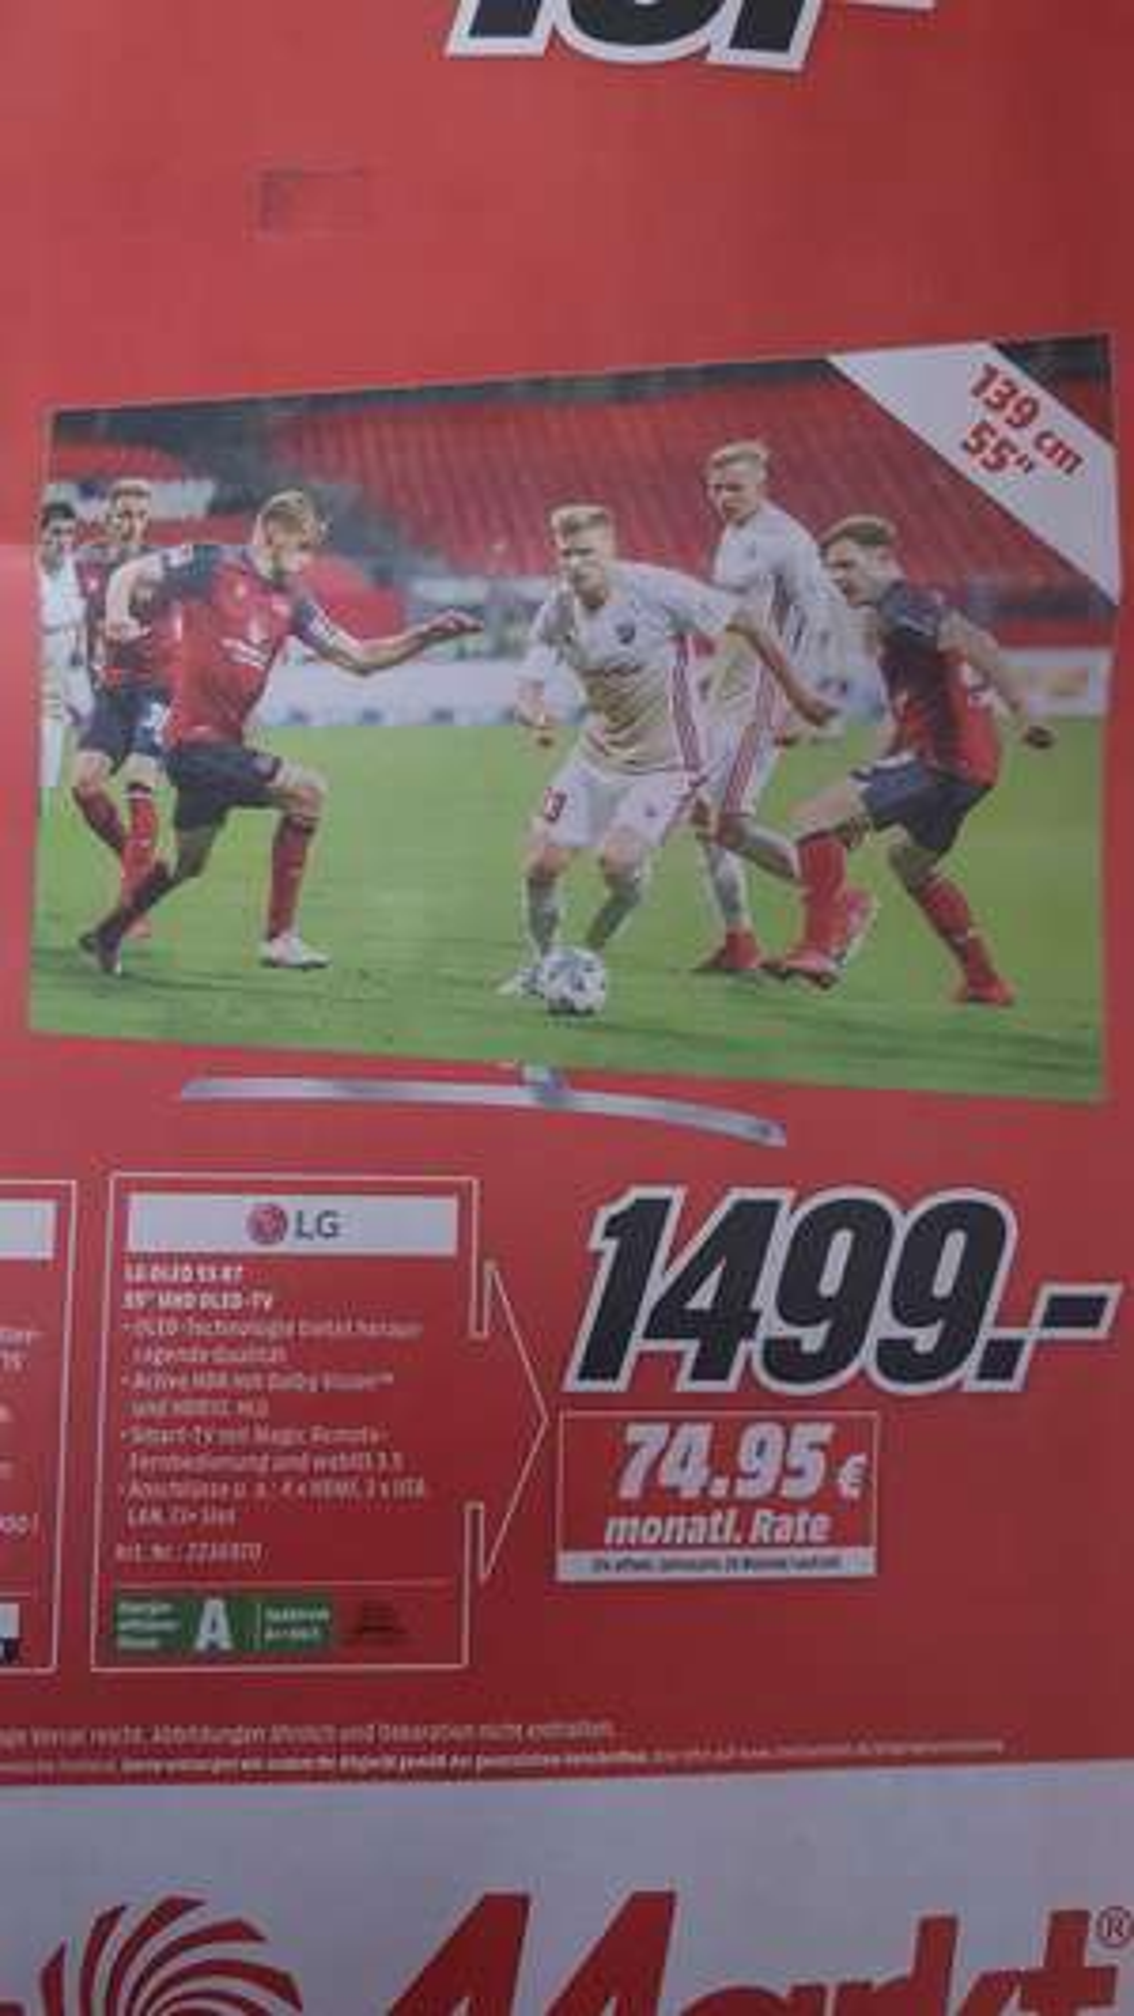 "(Lokal) LG OLED 55 B7D - 55"" UHD OLED-TV (Pirmasens)"